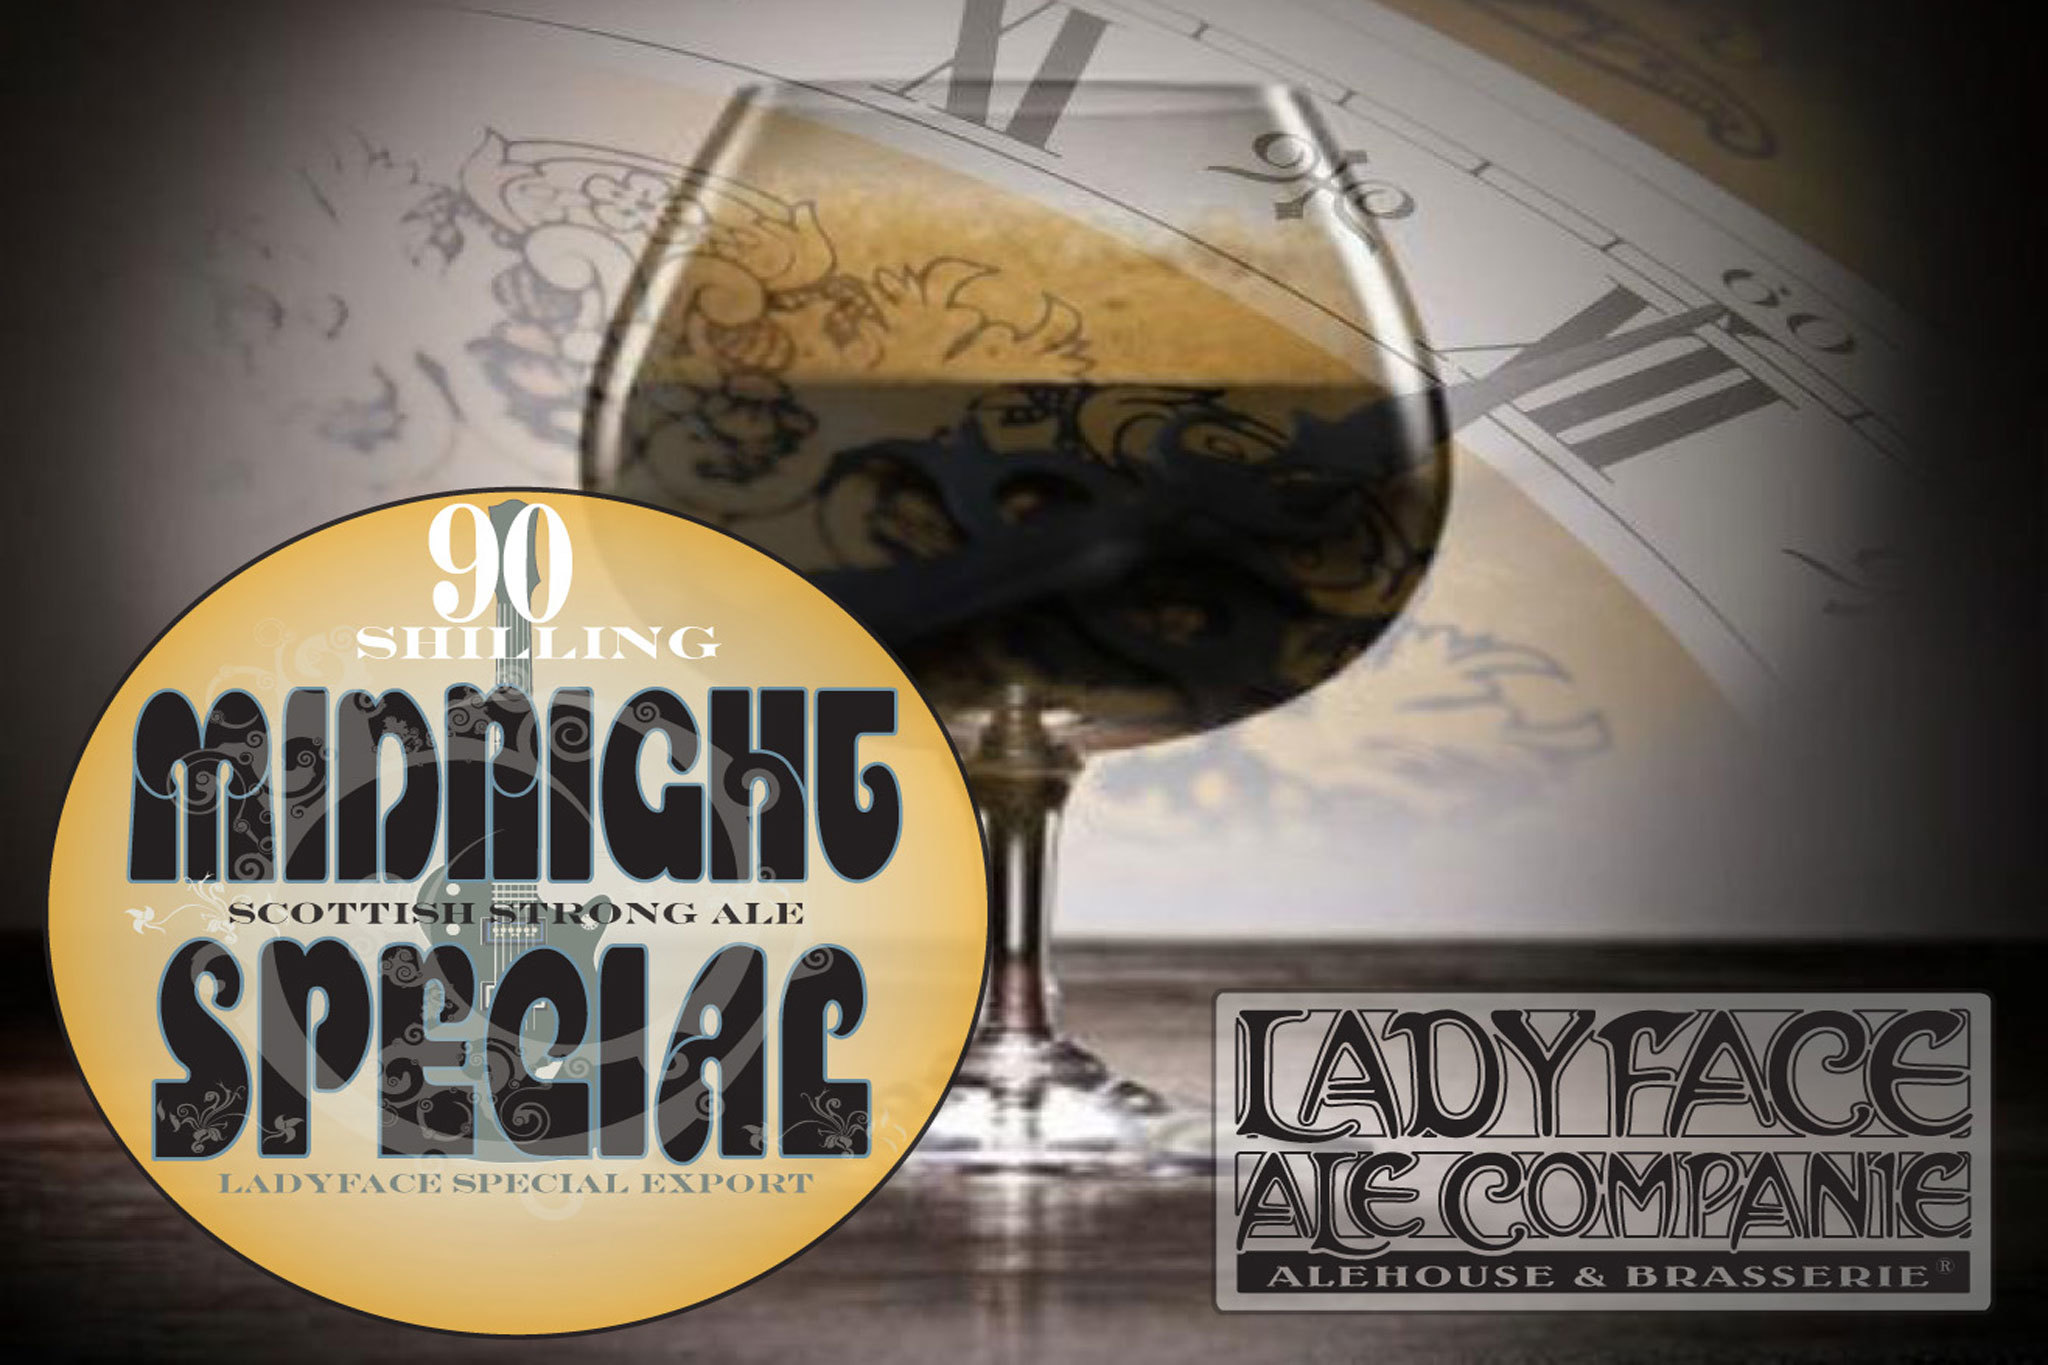 Ladyface Ale Companie: Midnight Special